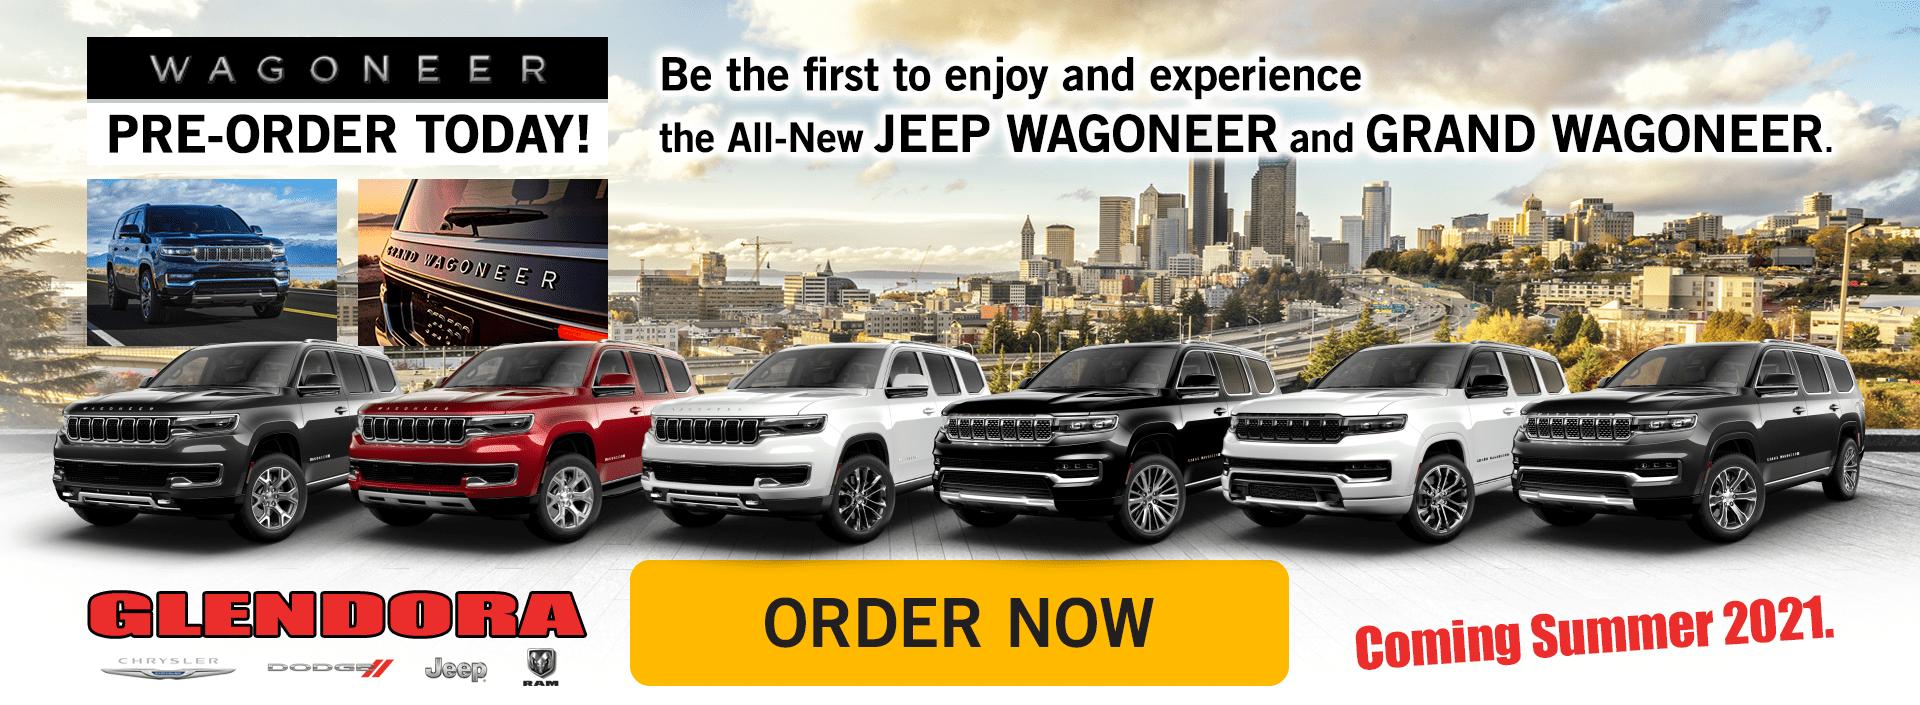 Jeep_Wagoneer_Jeep_Grand_Wagoneer_Pre_Order